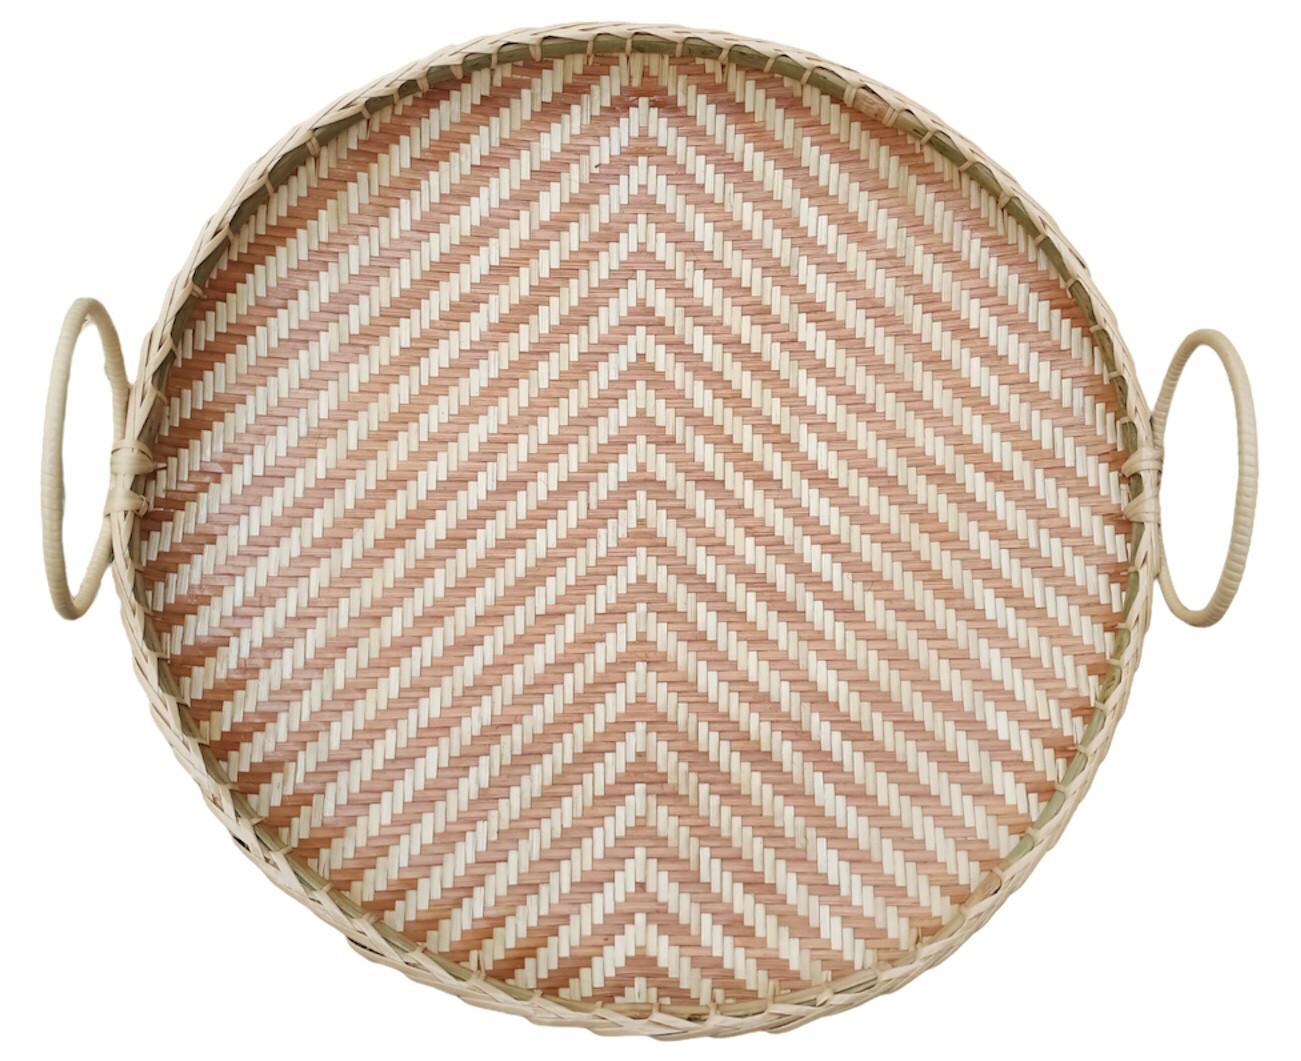 Circle basket Bam boo Strip Brown